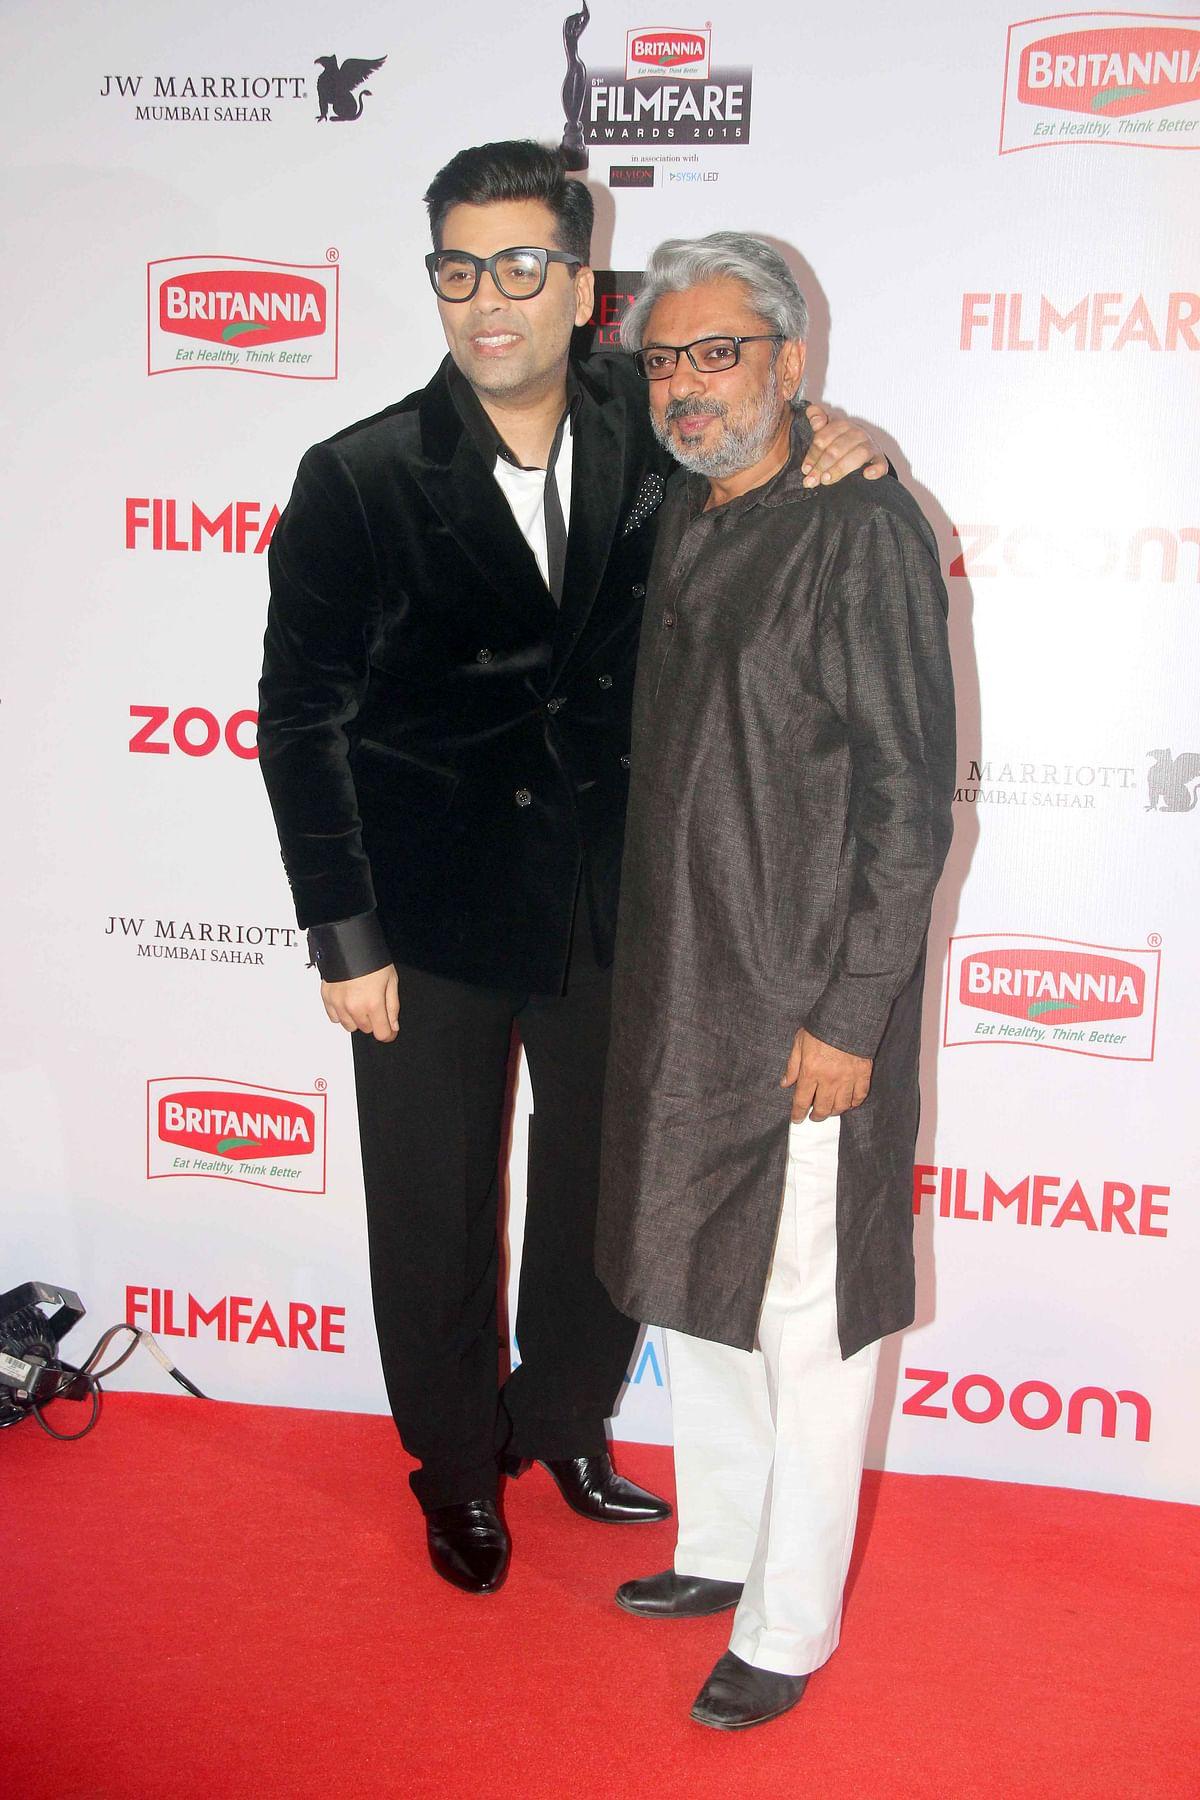 Duo worth a  million bucks: Karan Johar and Sanjay Leela Bhansali (Photo: Yogen Shah)